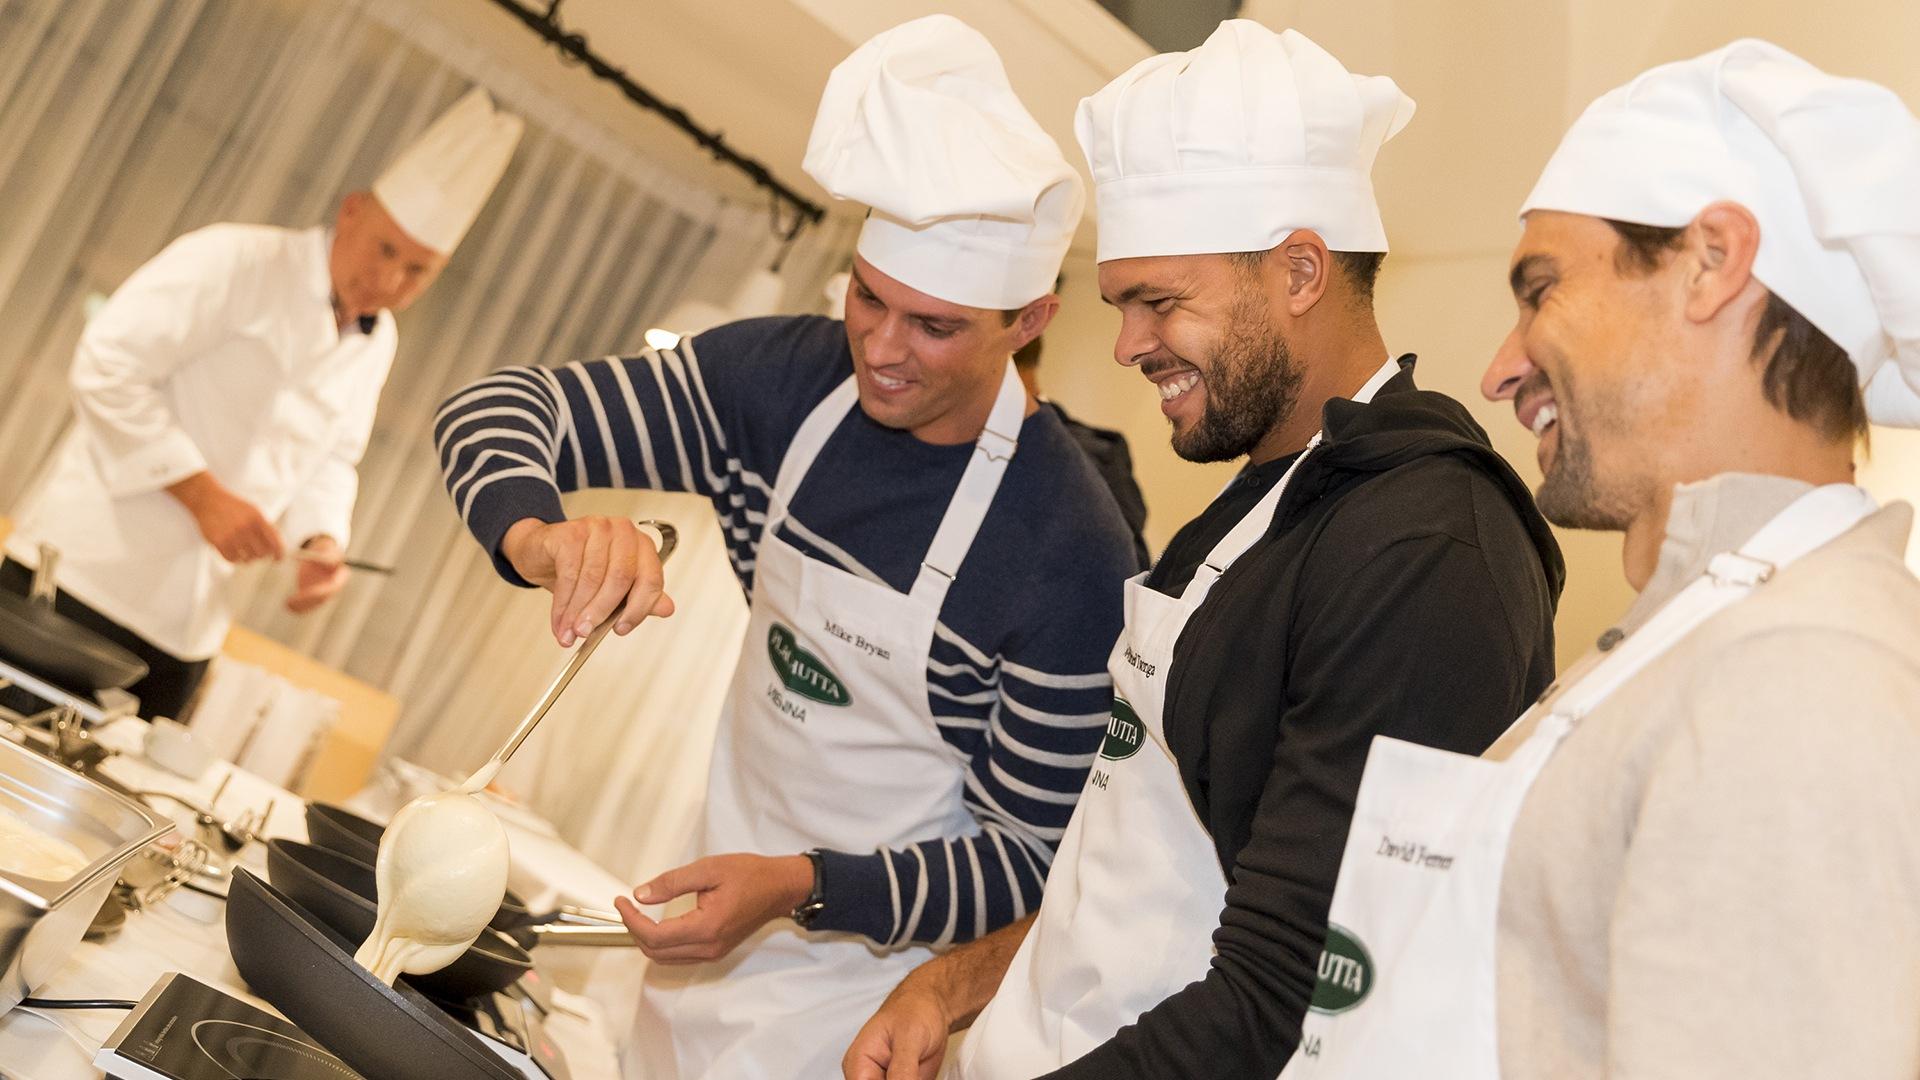 Cauchemar En Cuisine Streaming Philippe Etchebest Inspirant Photos Les 27 Meilleur Cauchemar En Cuisine Marseille Streaming